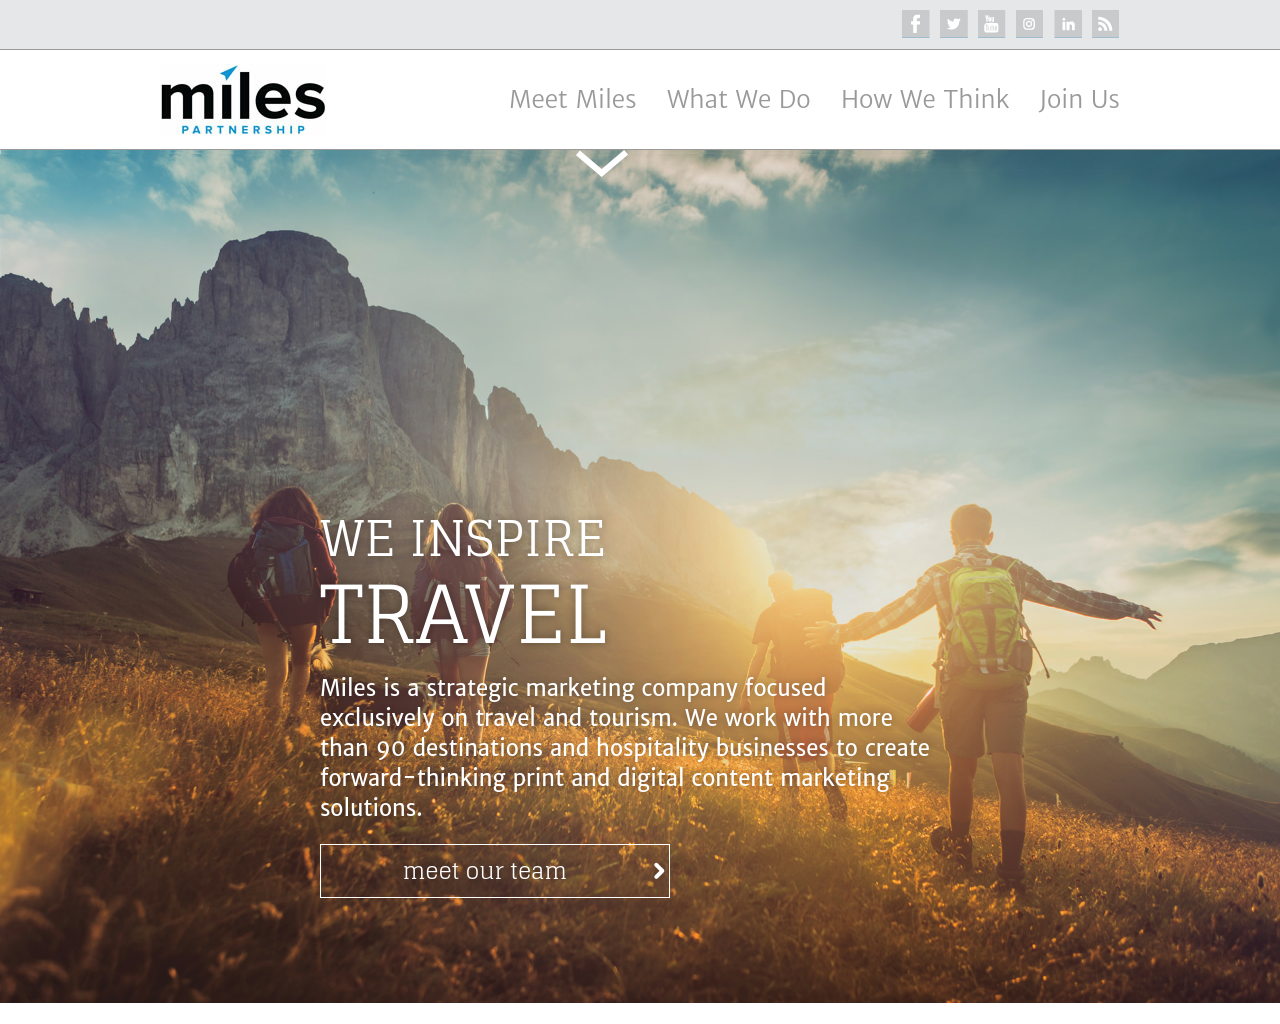 Miles-Advertising-Reviews-Pricing